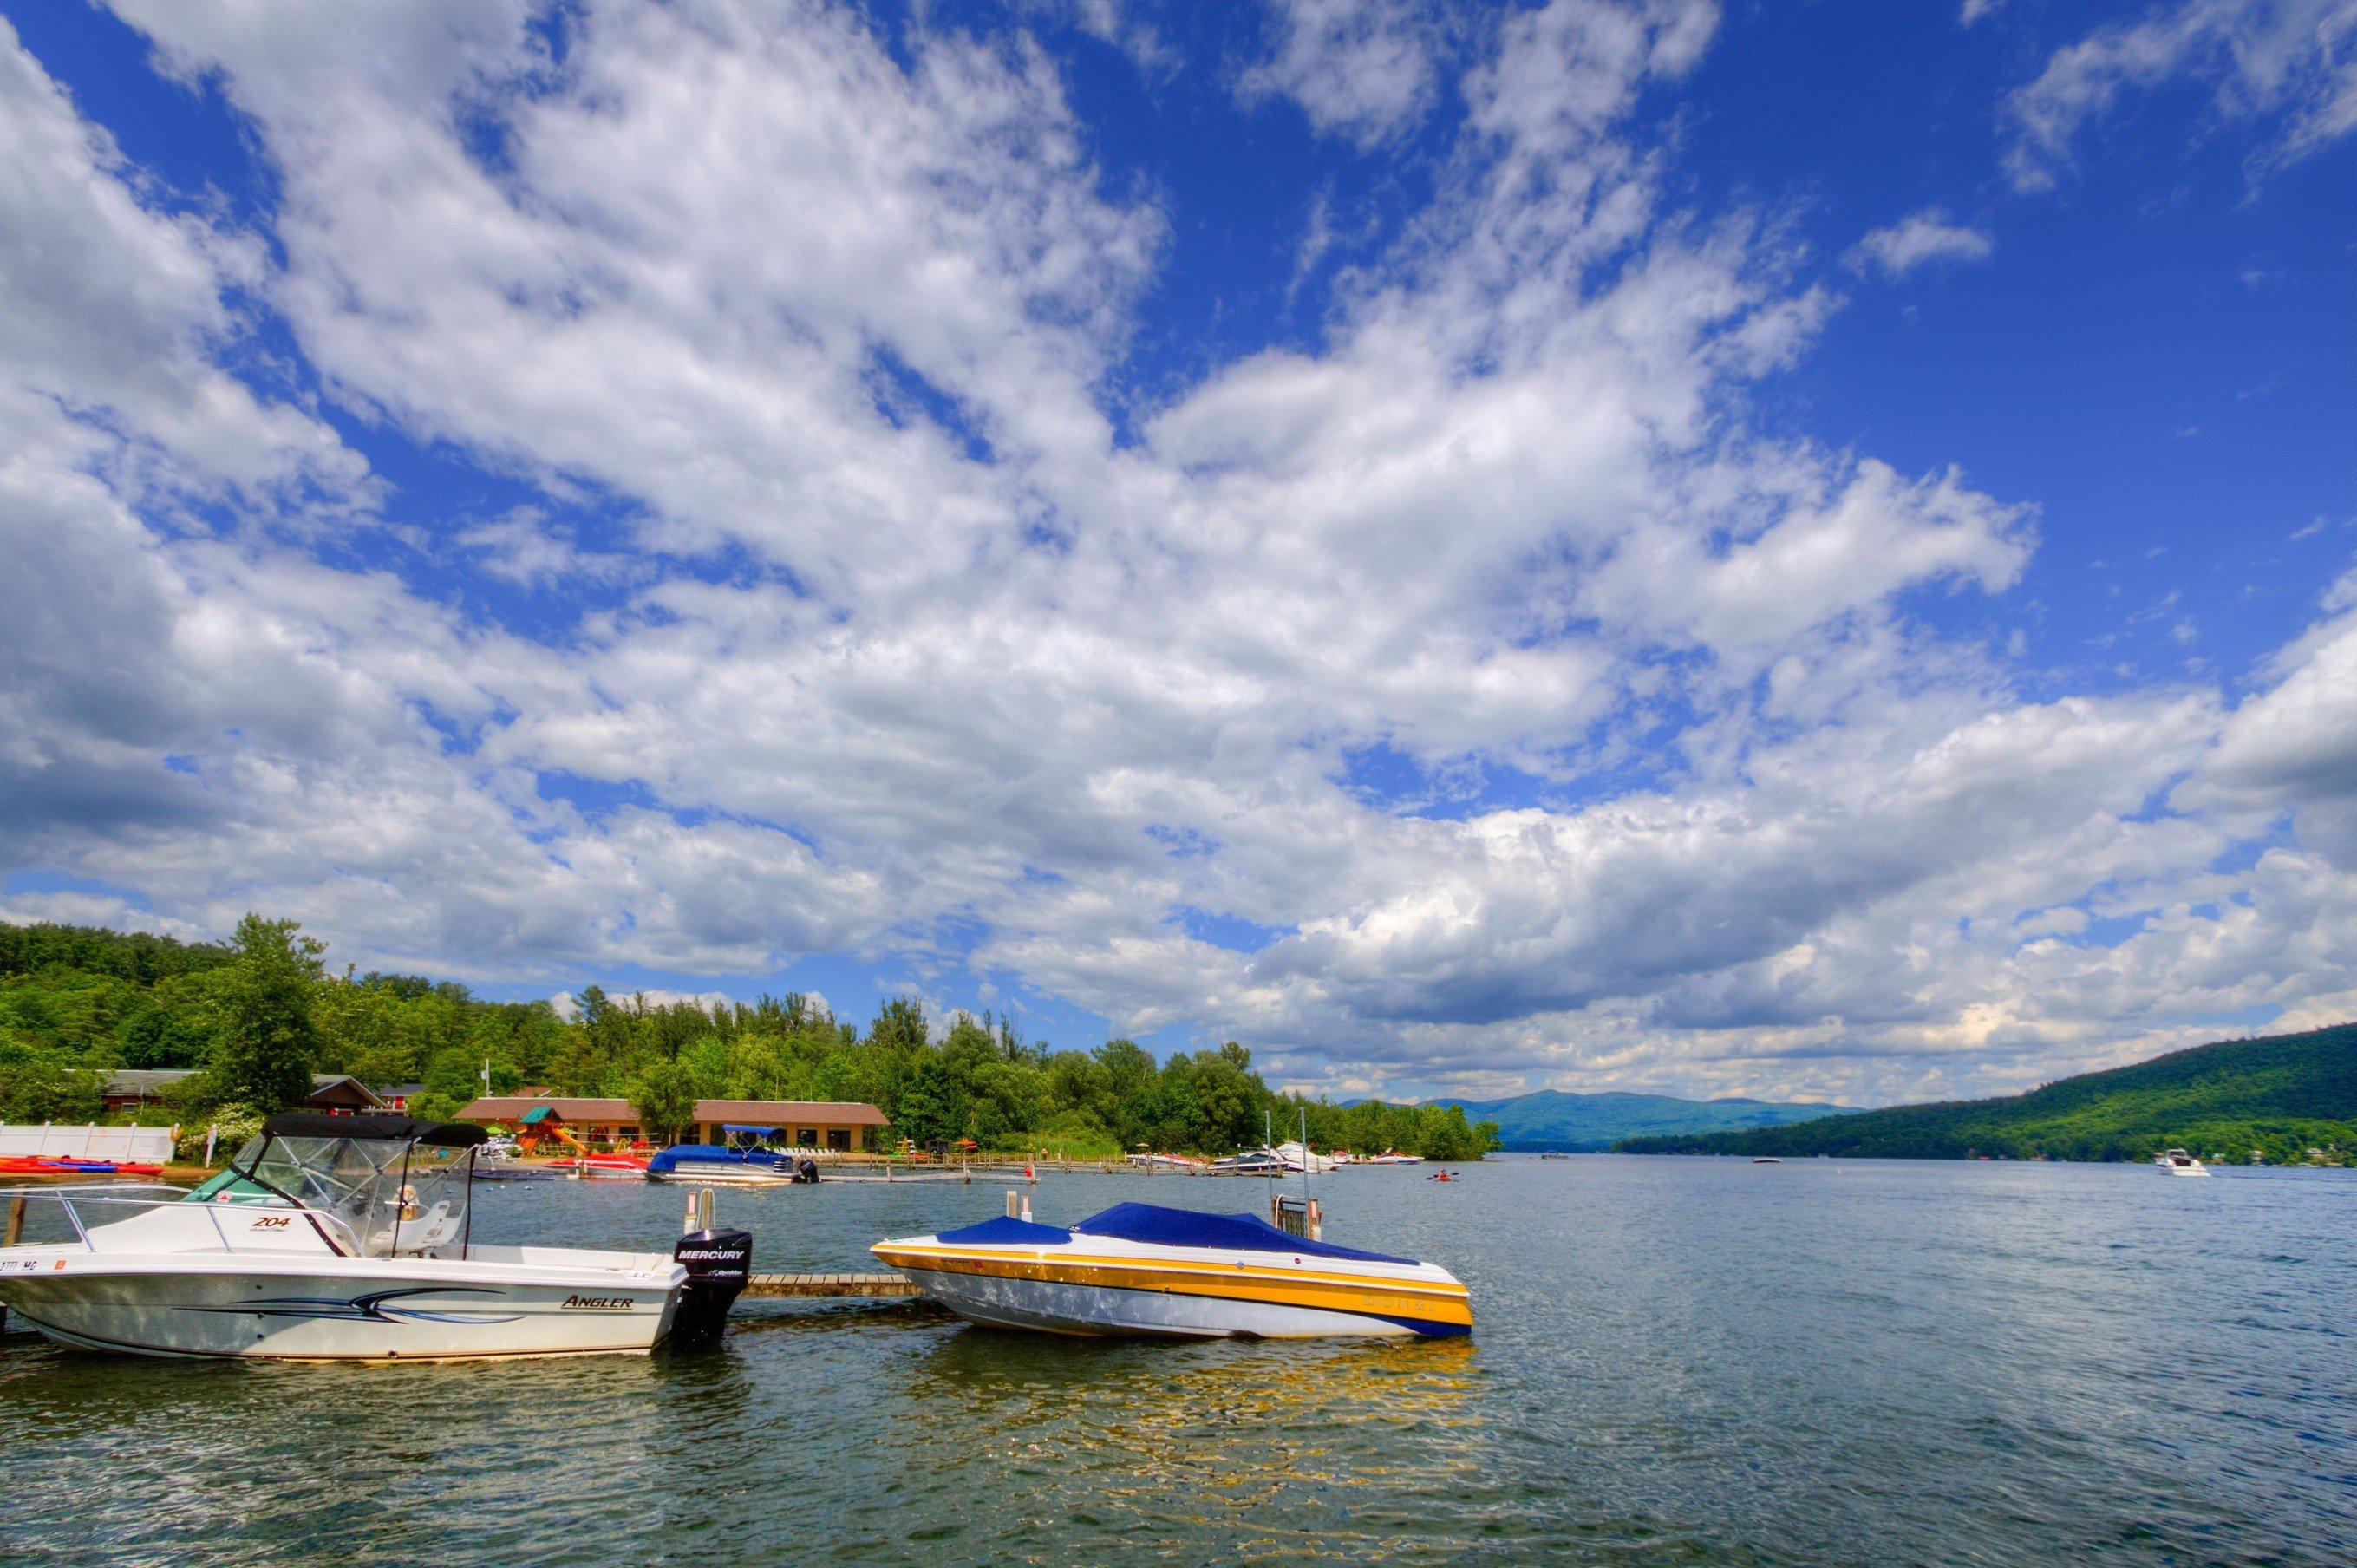 Trip Ideas sky water outdoor Boat Sea boating vehicle cloud shore Lake bay loch watercraft day